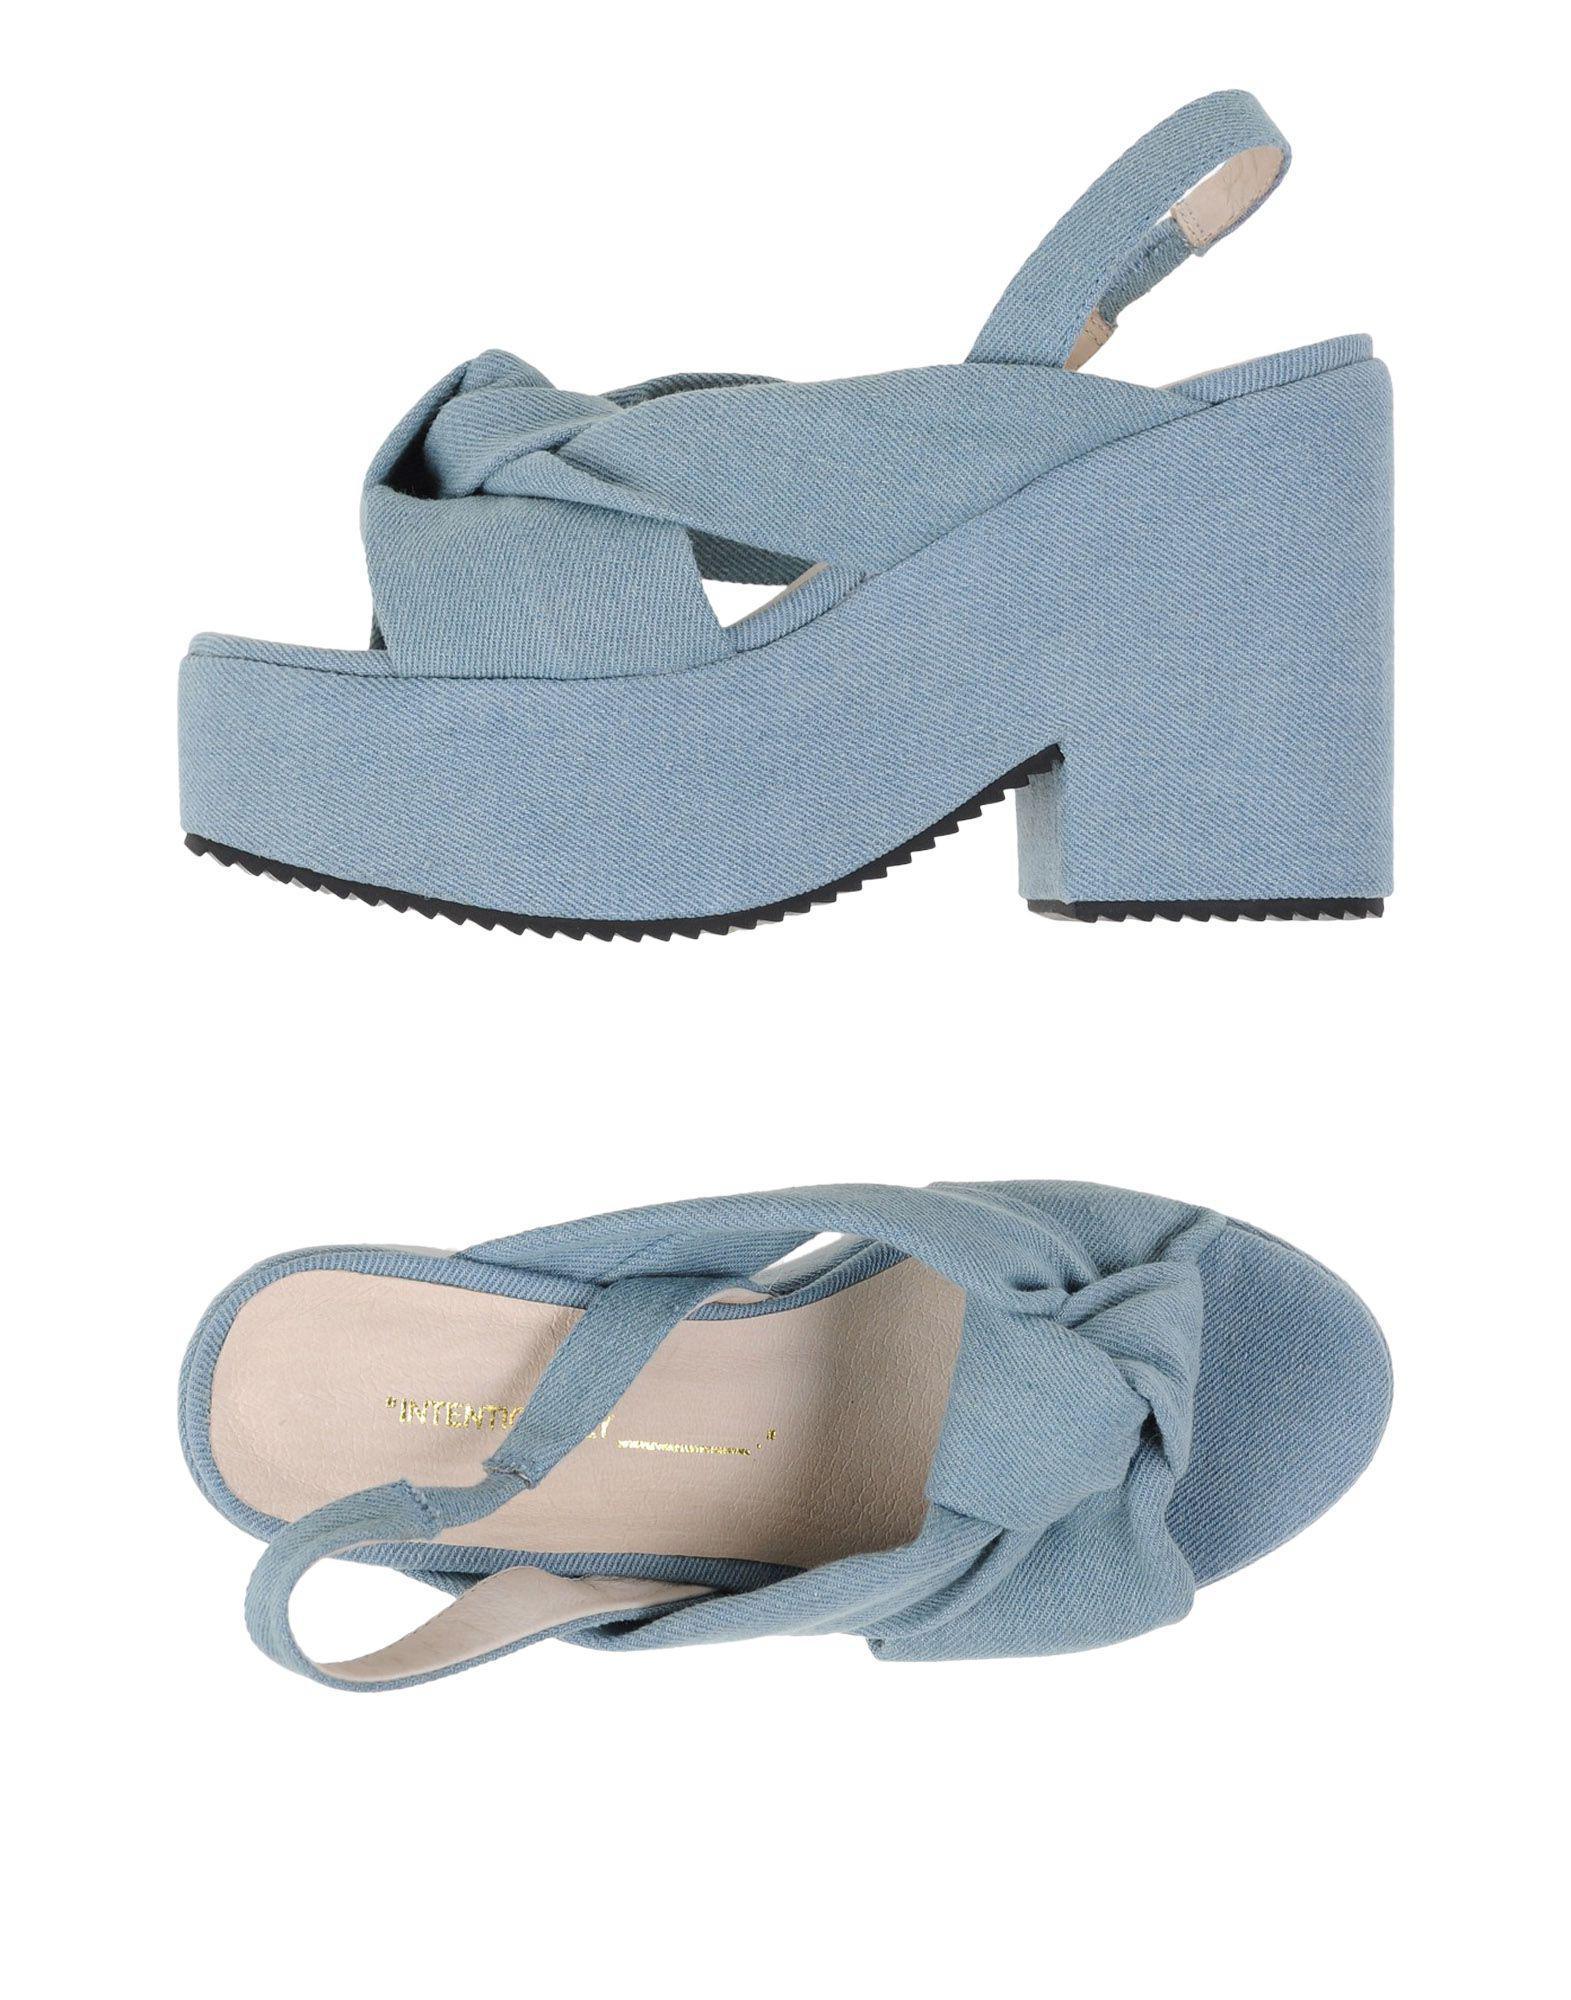 Intentionally_______. Intentionnellement_______. Sandals Des Sandales vQVVkb